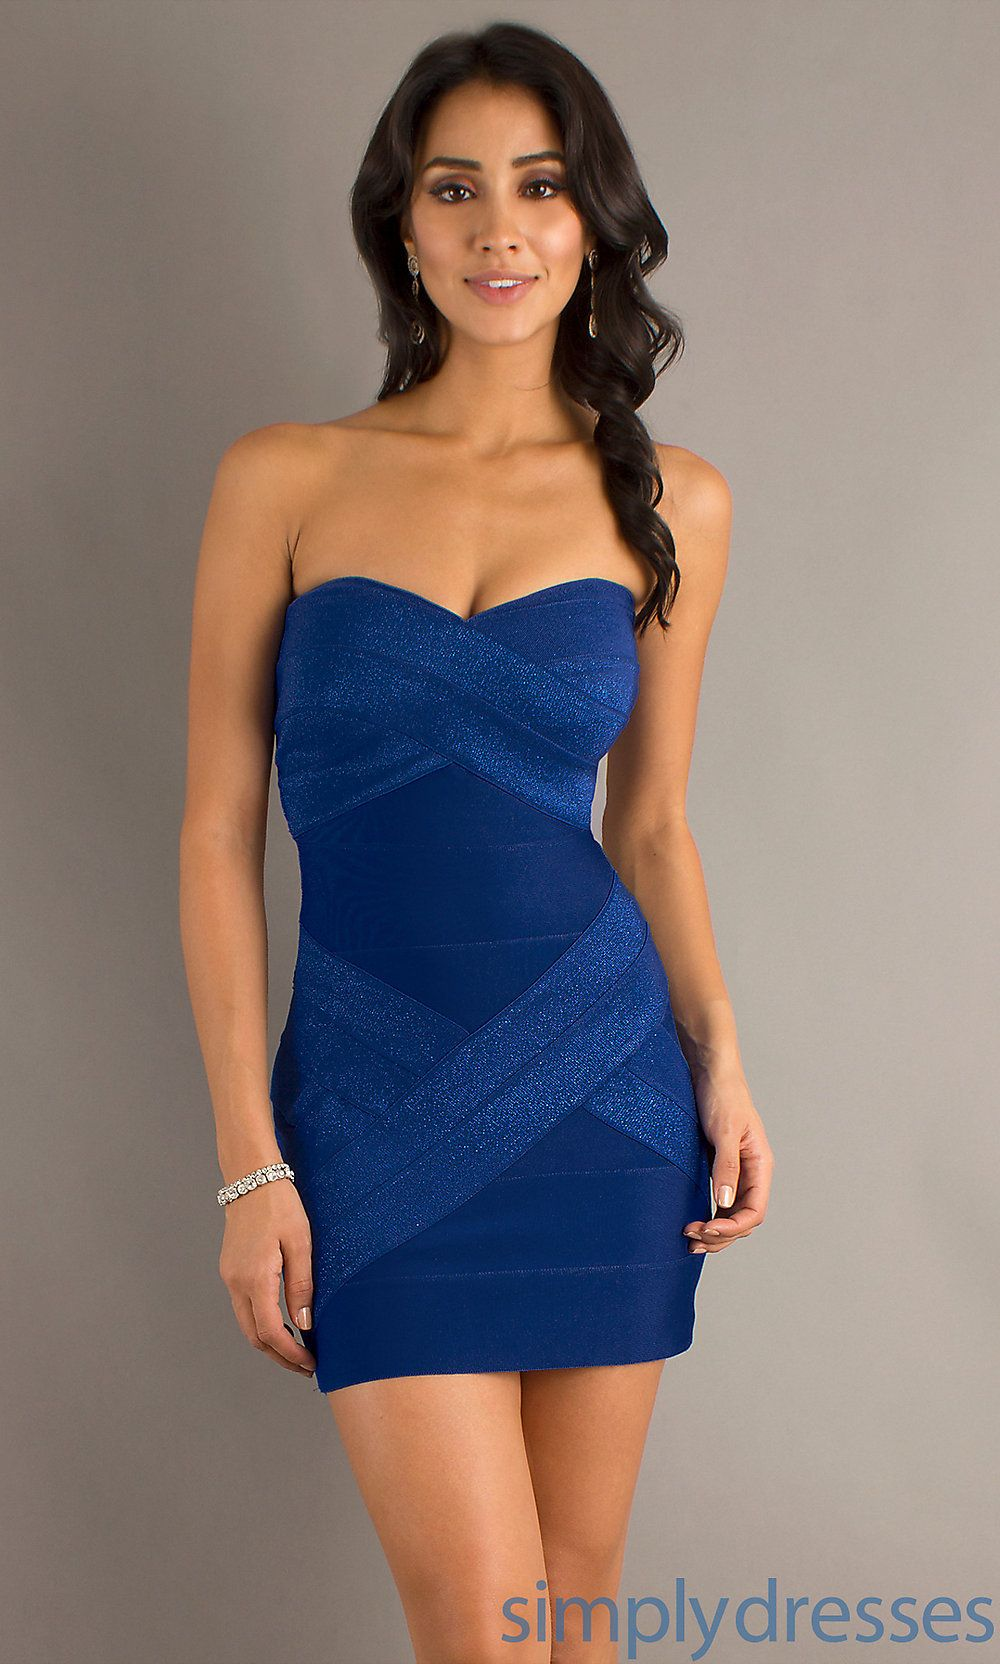 Strapless blue cocktail dress